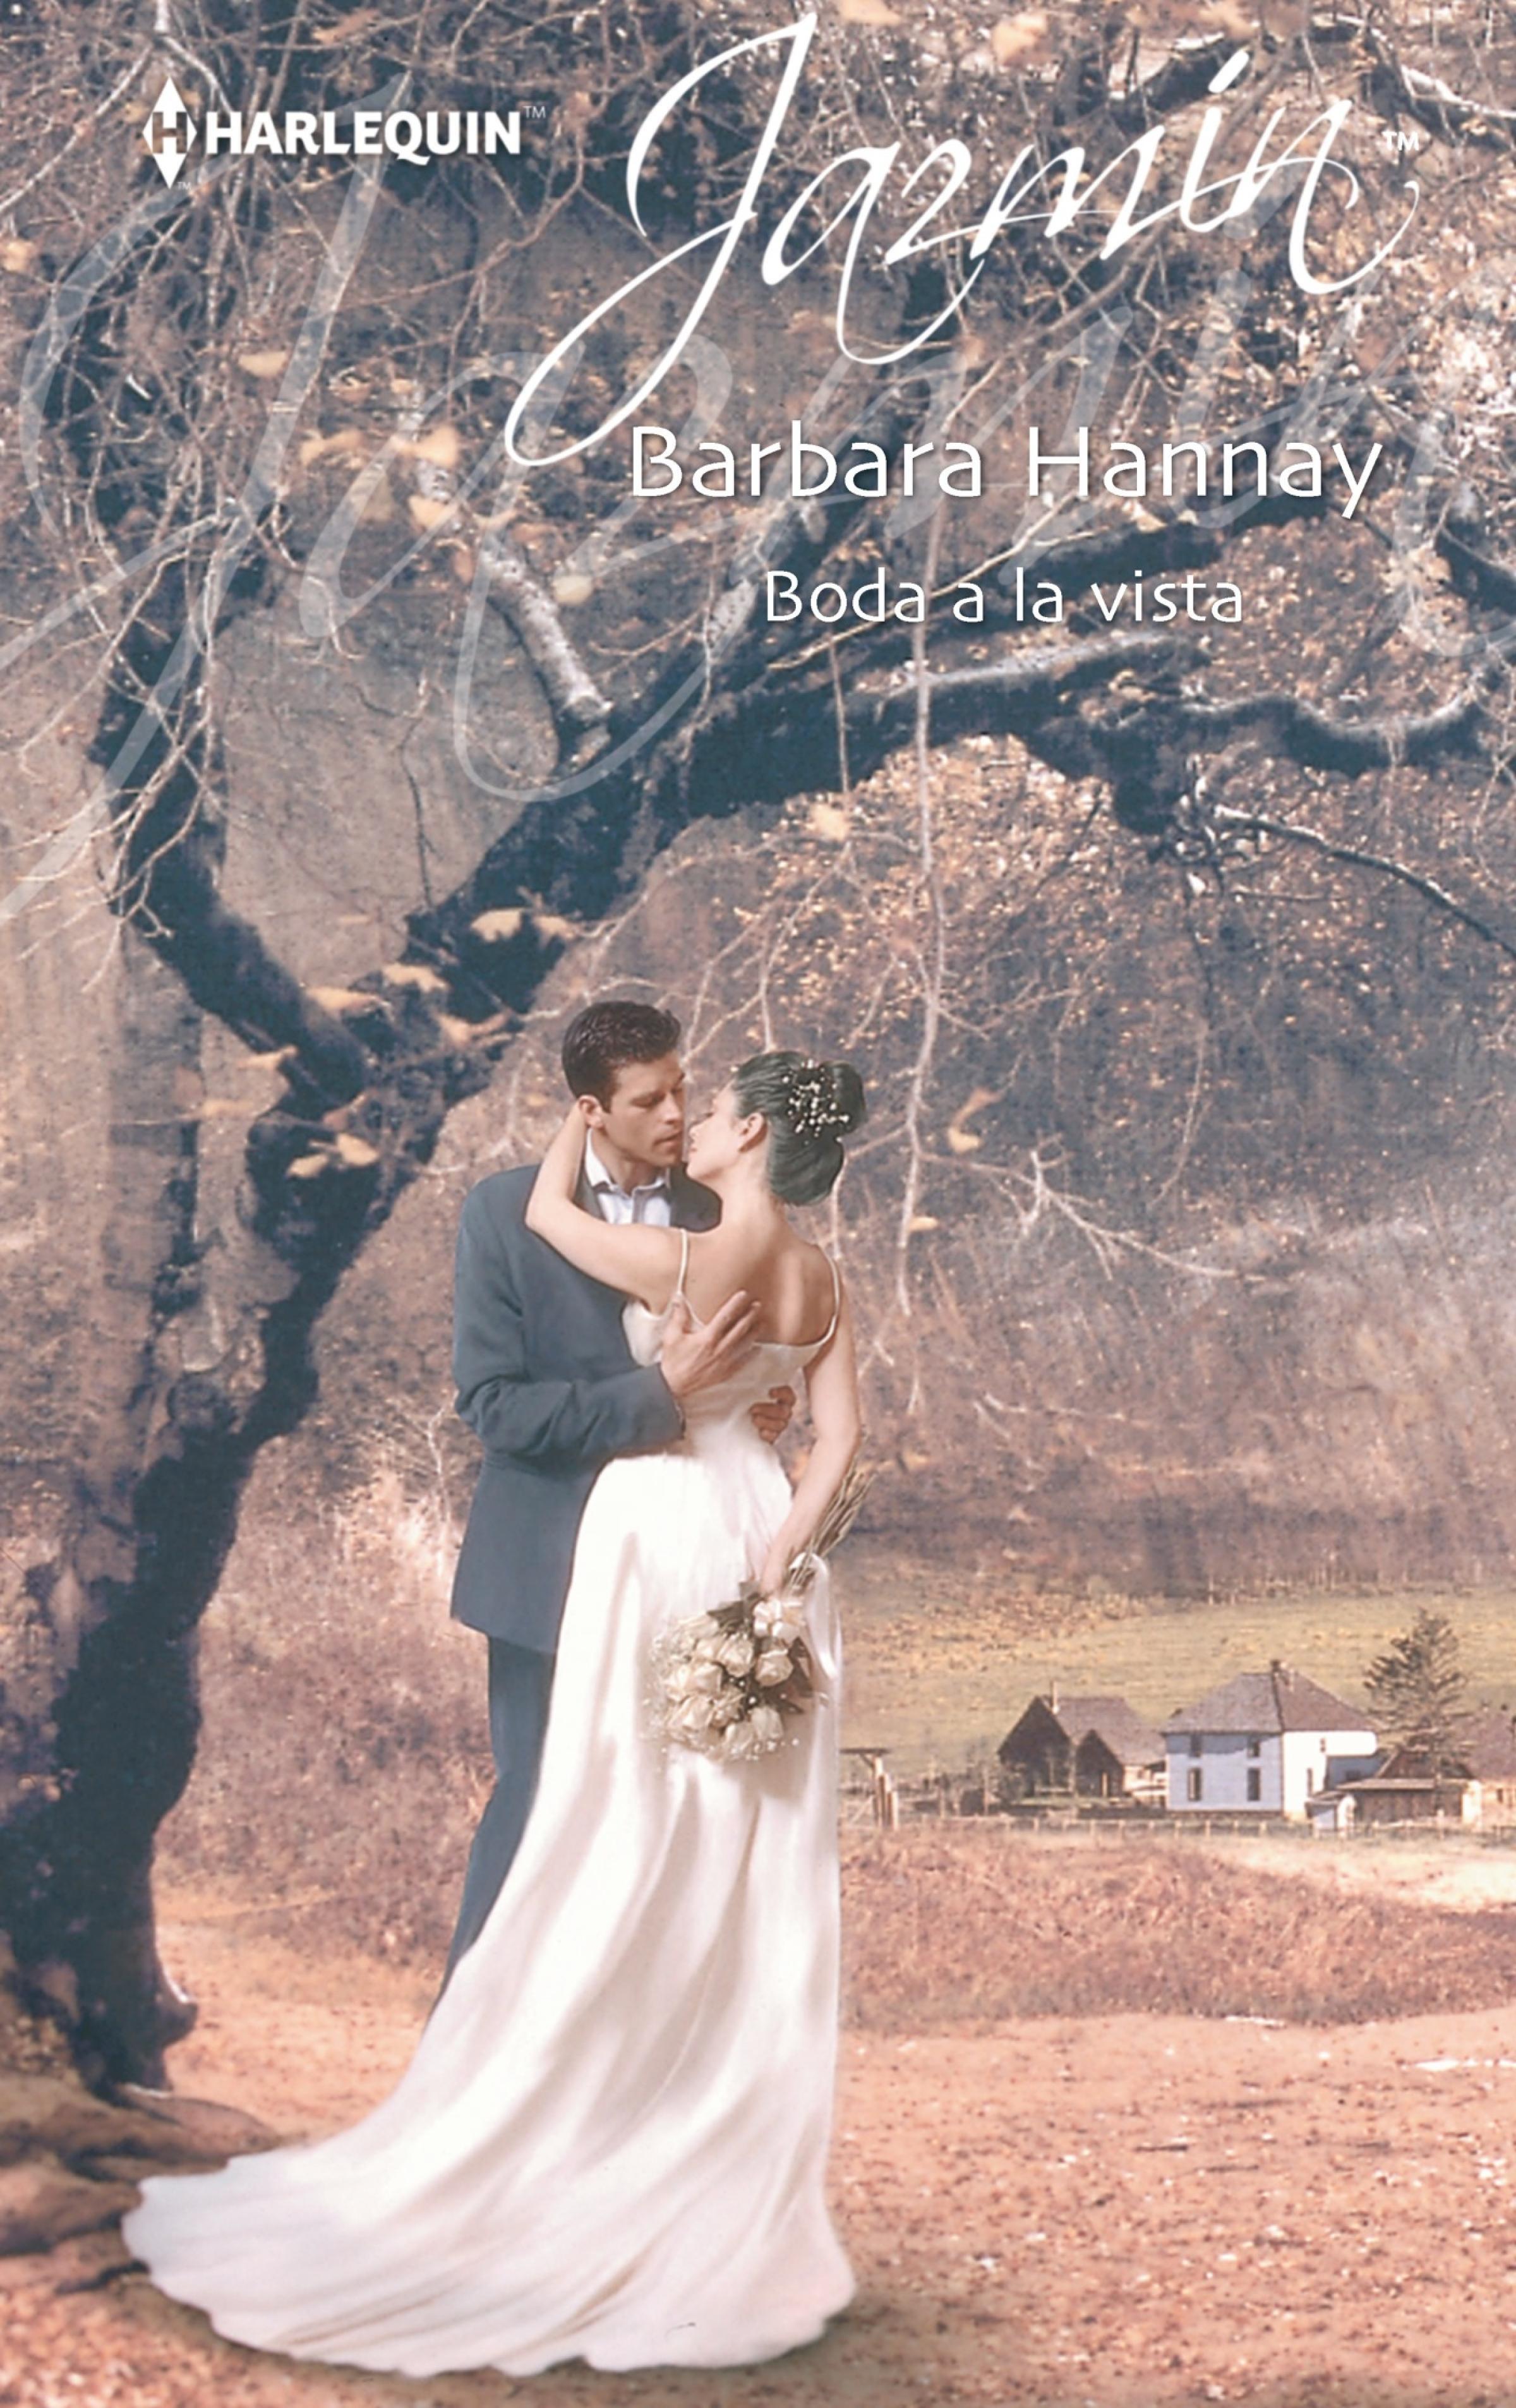 Barbara Hannay Boda a la vista barbara hannay the wedding countdown